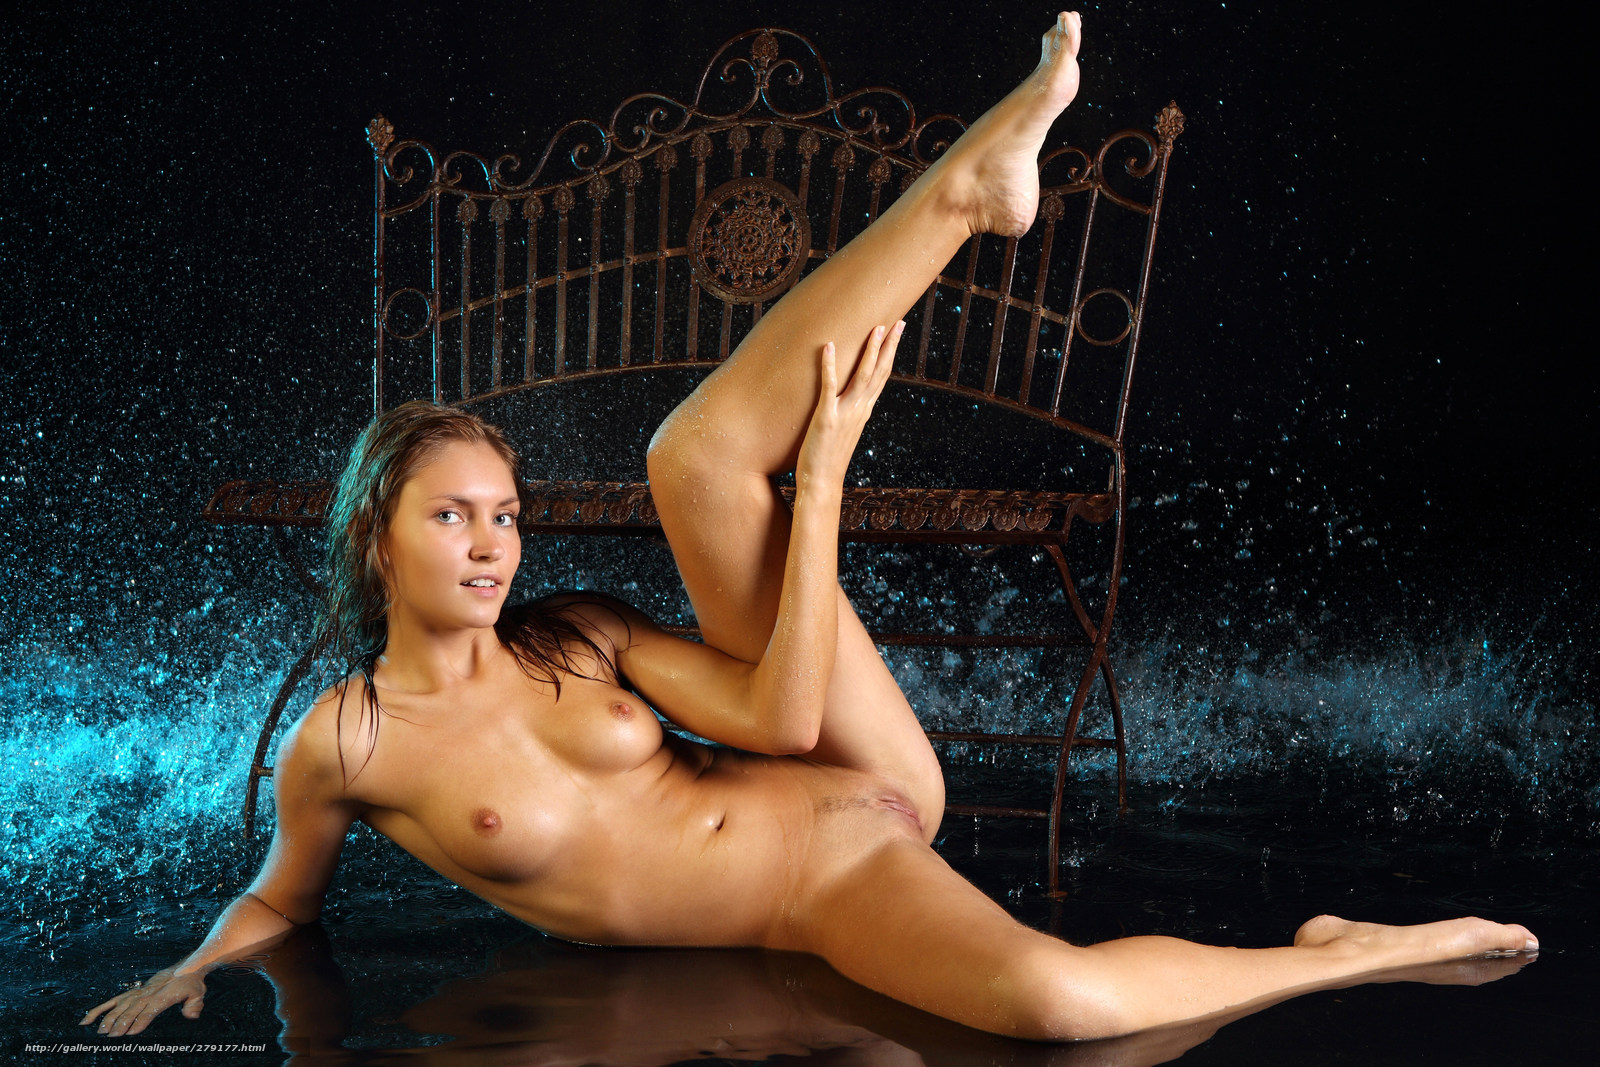 Sindori nude wallpapers pron images